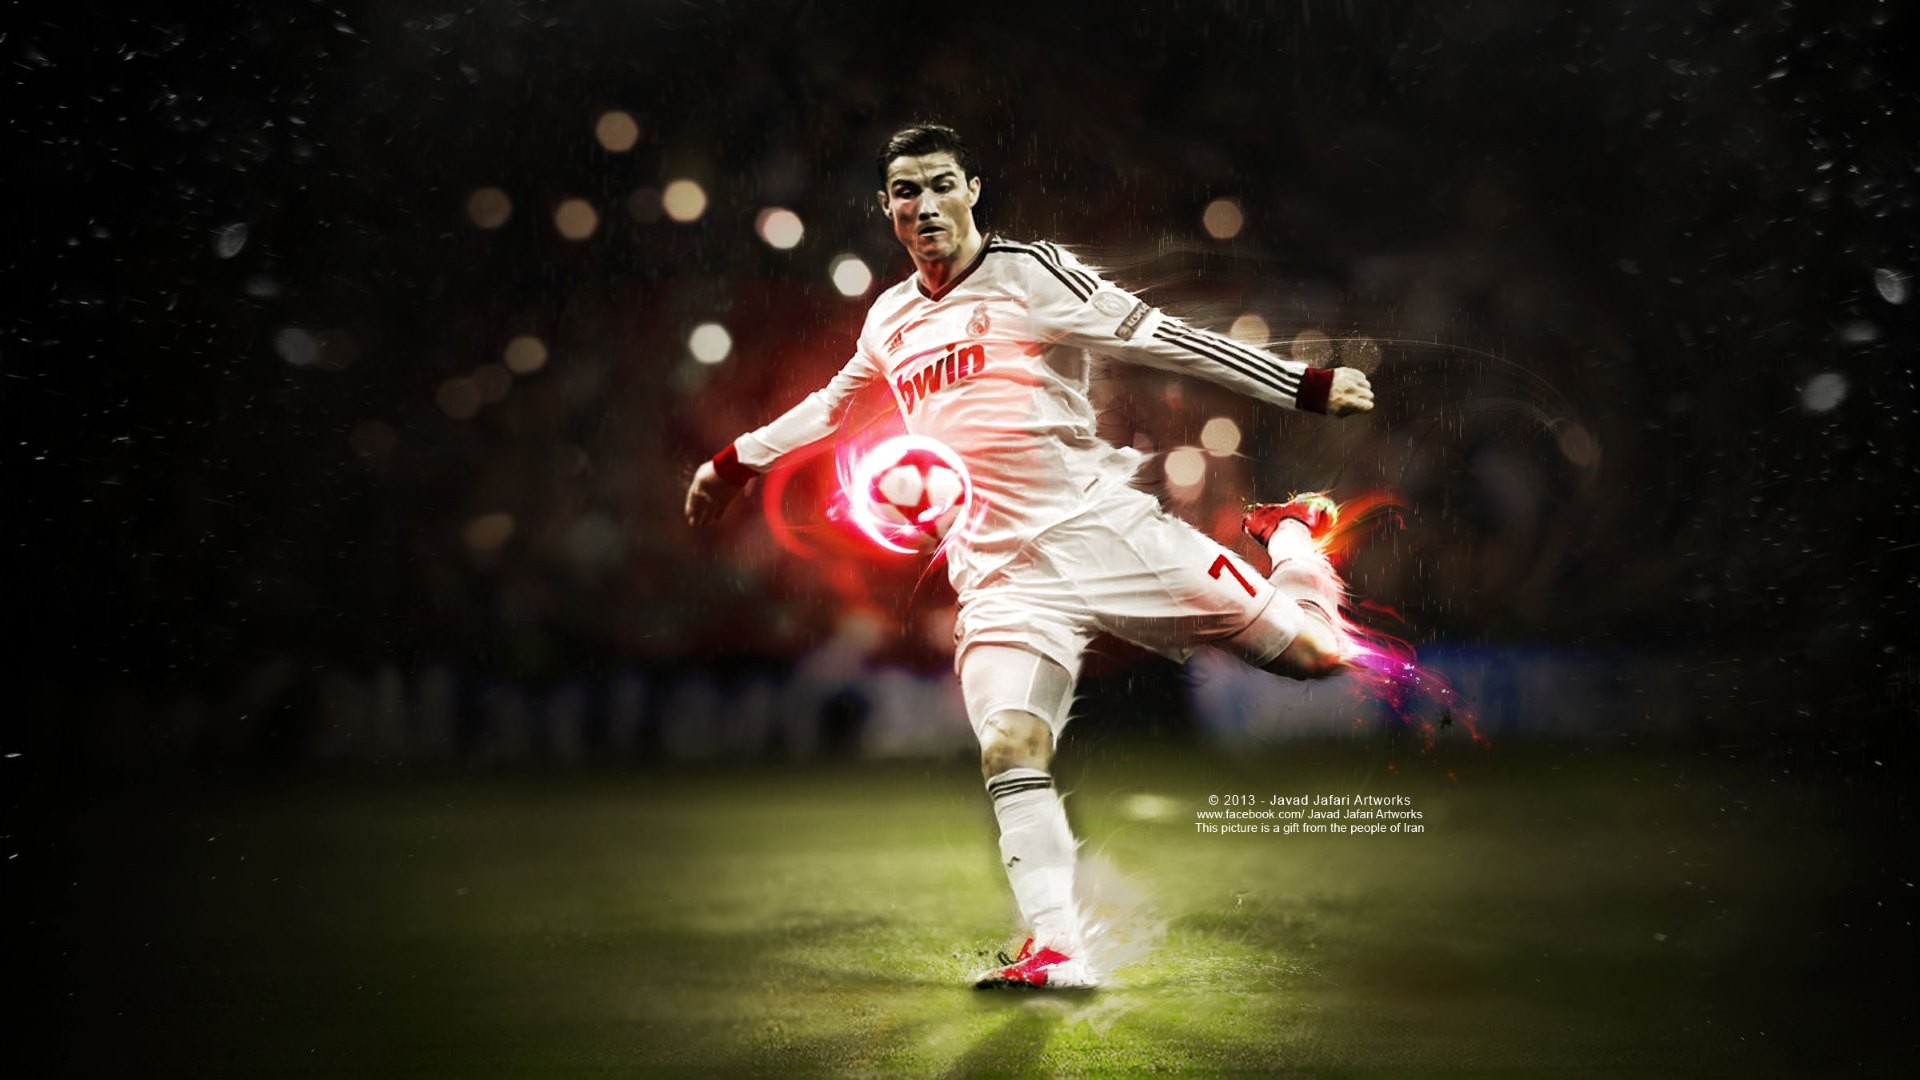 Cristiano Ronaldo Wallpaper ·① Download Free Amazing High